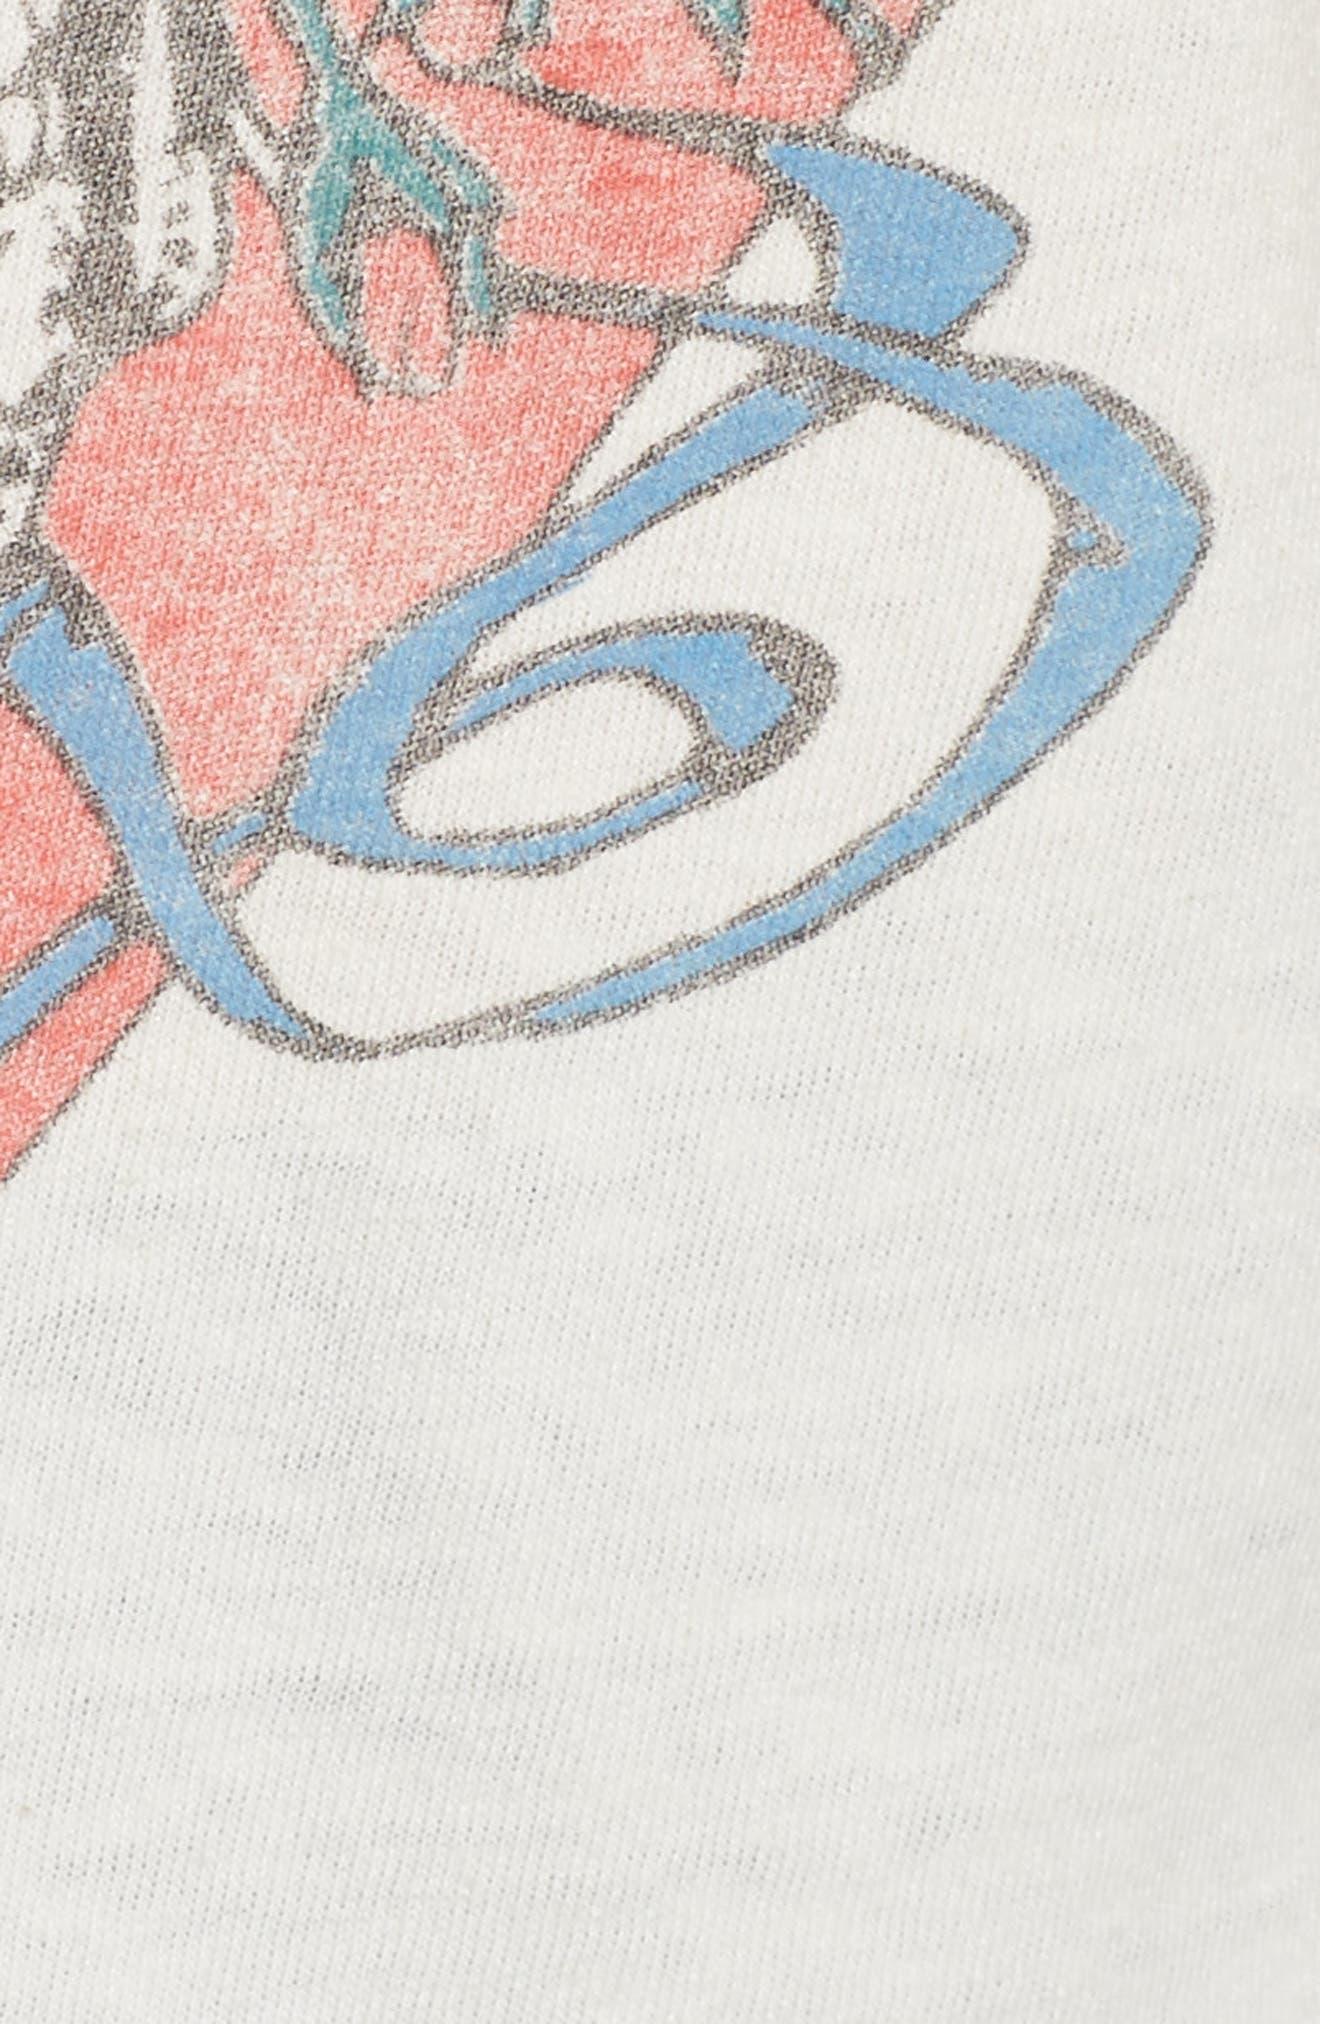 Grateful Dead Tee,                             Alternate thumbnail 5, color,                             Vintage White